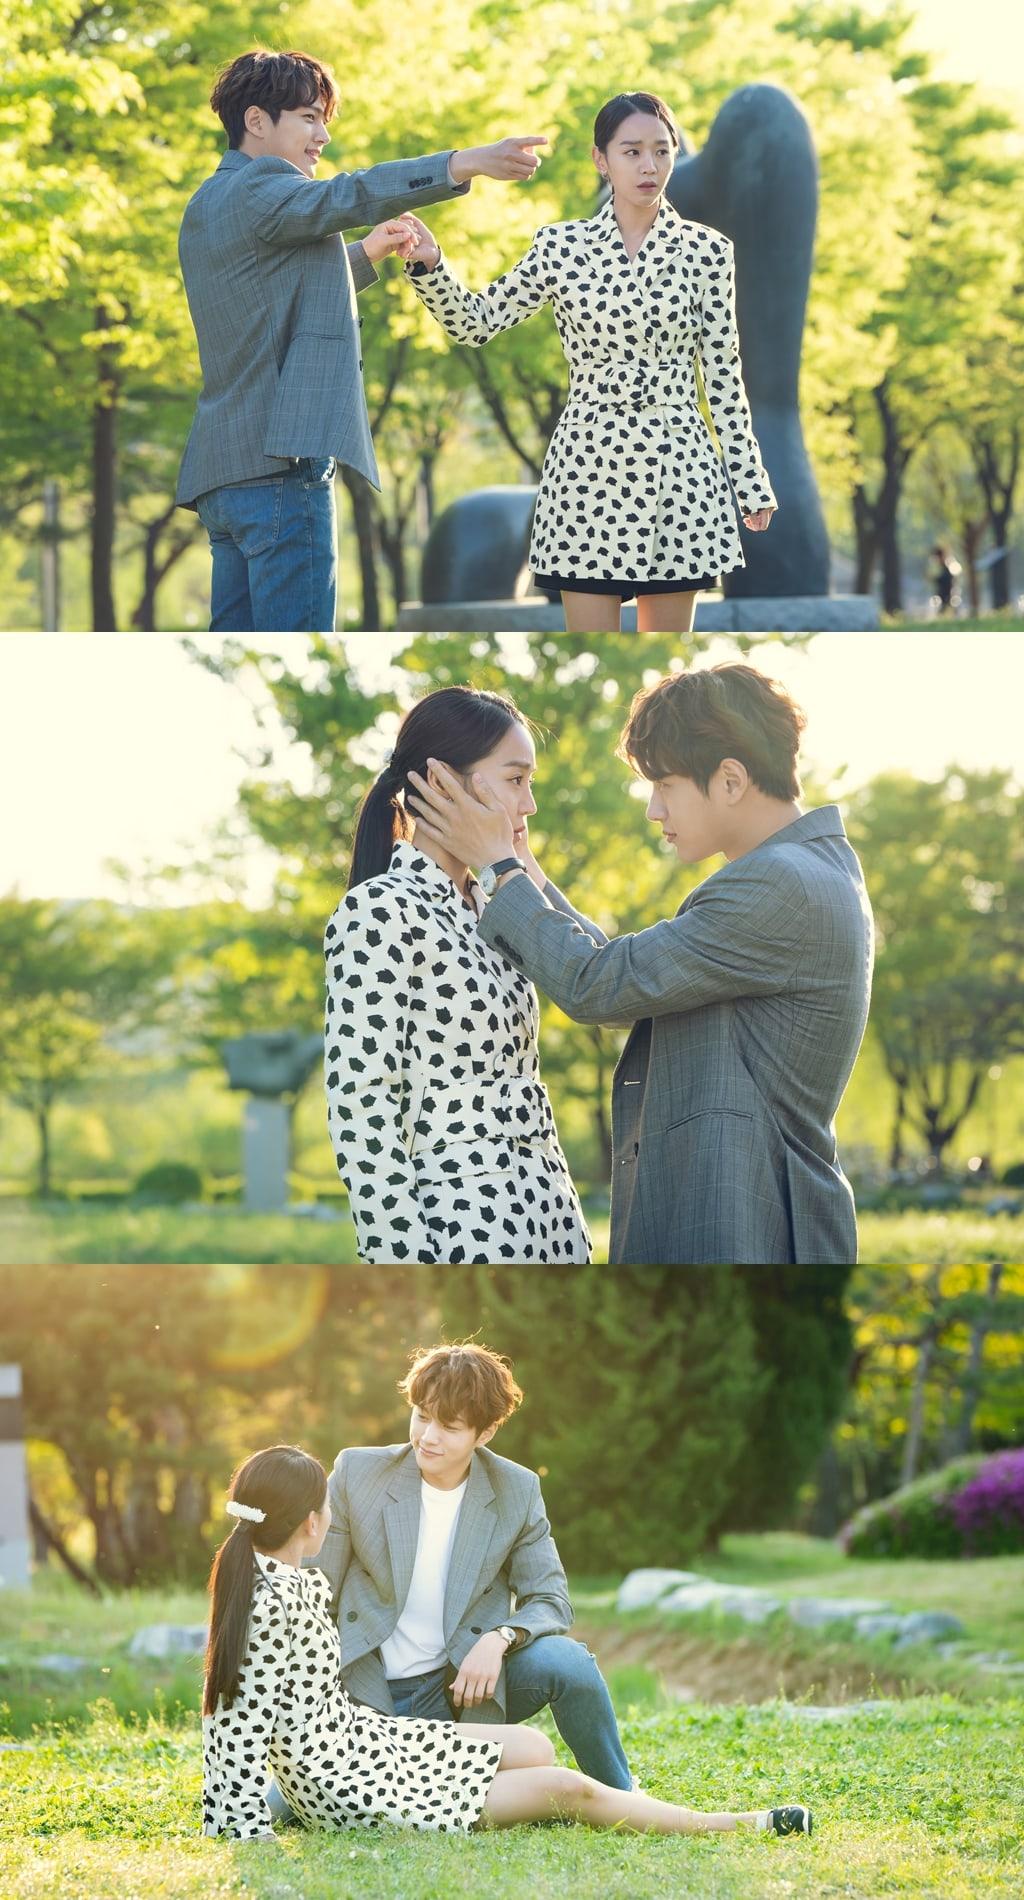 INFINITE's L Melts Shin Hye Sun's Heart With Romantic